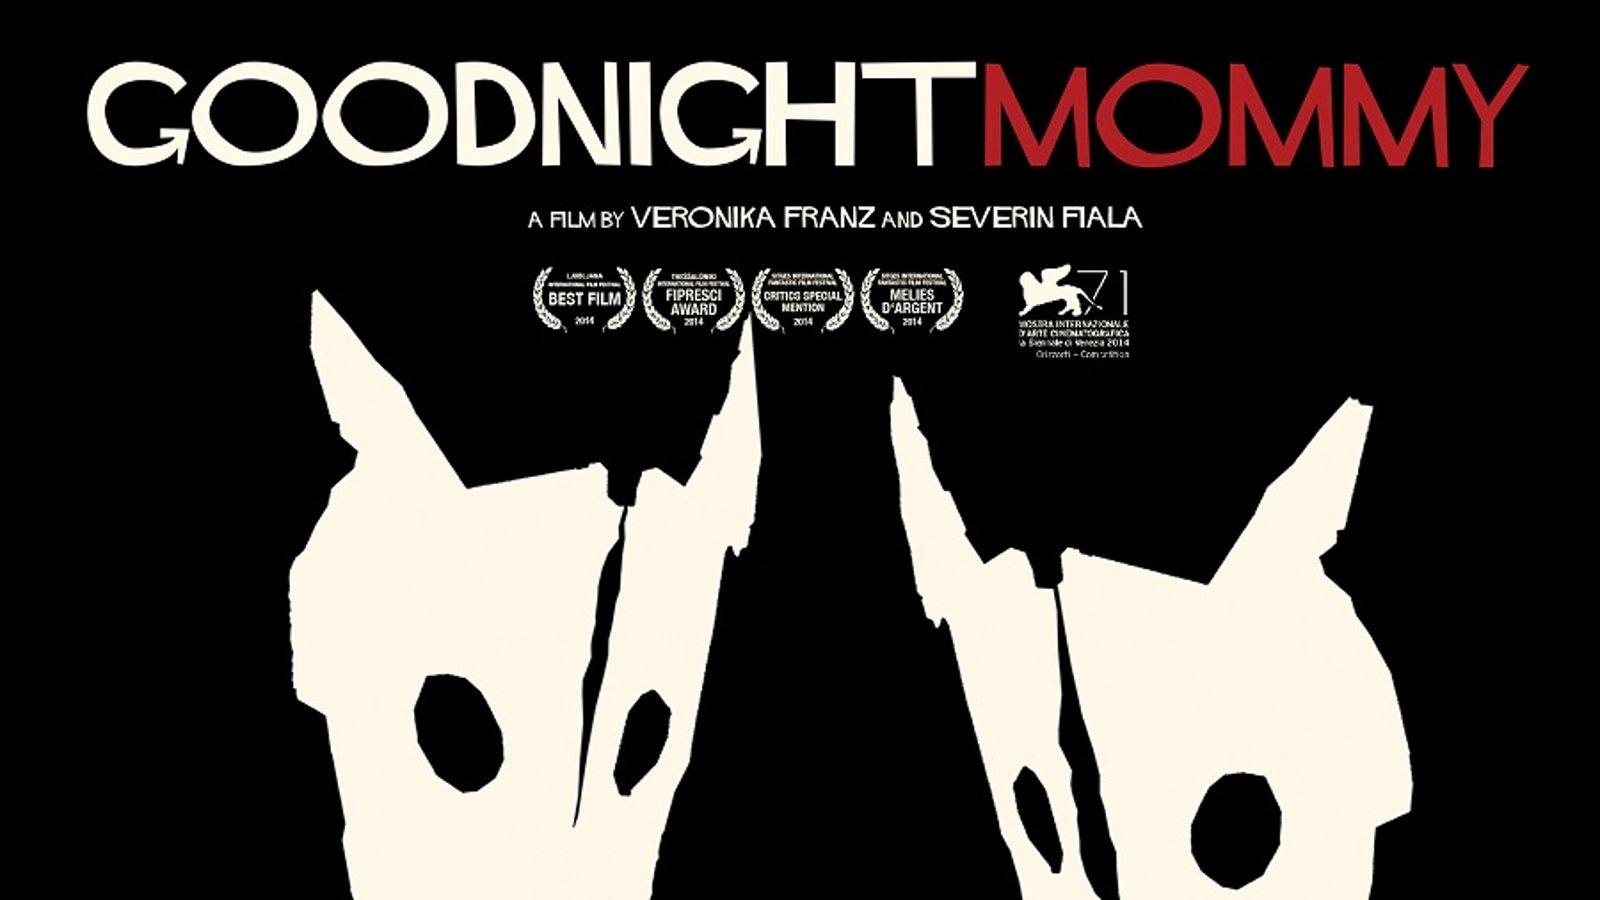 Goodnight Mommy - Ich seh ich seh